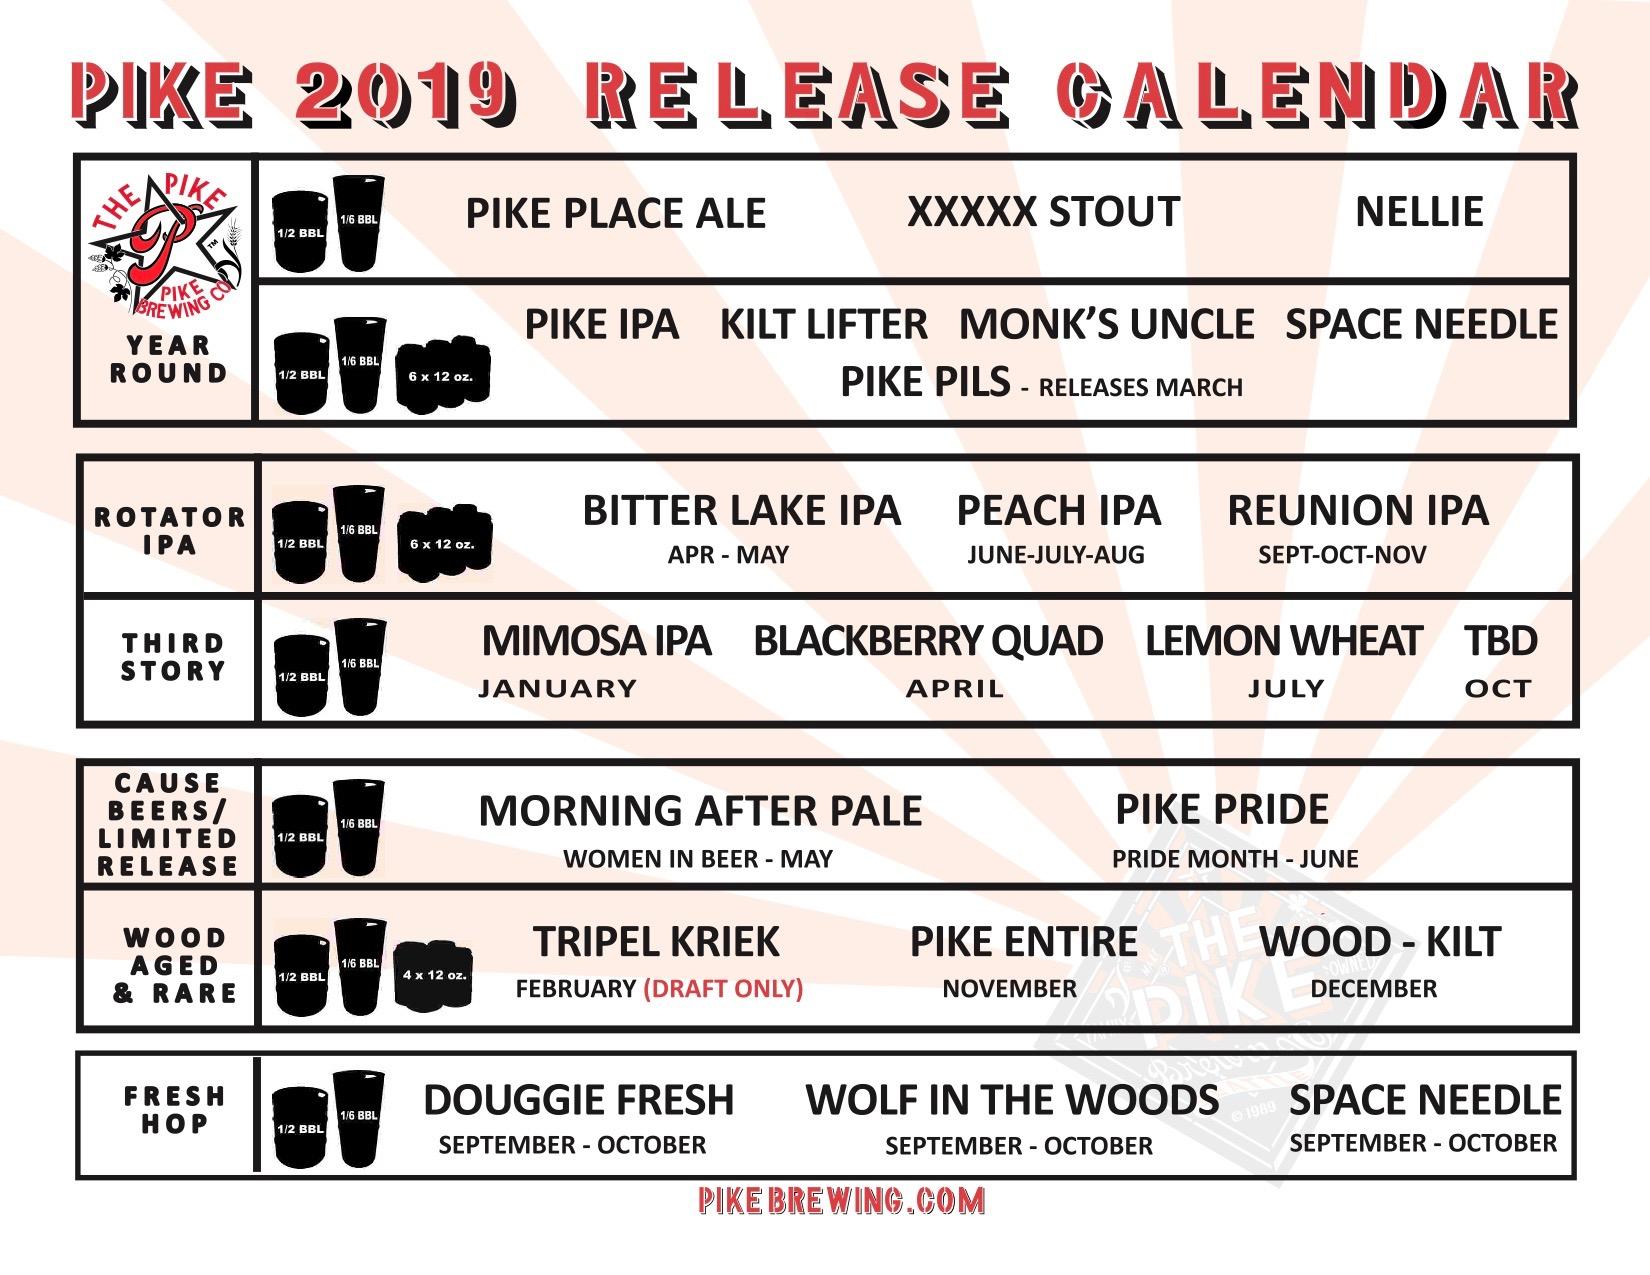 Pike 2019 Release Calendar